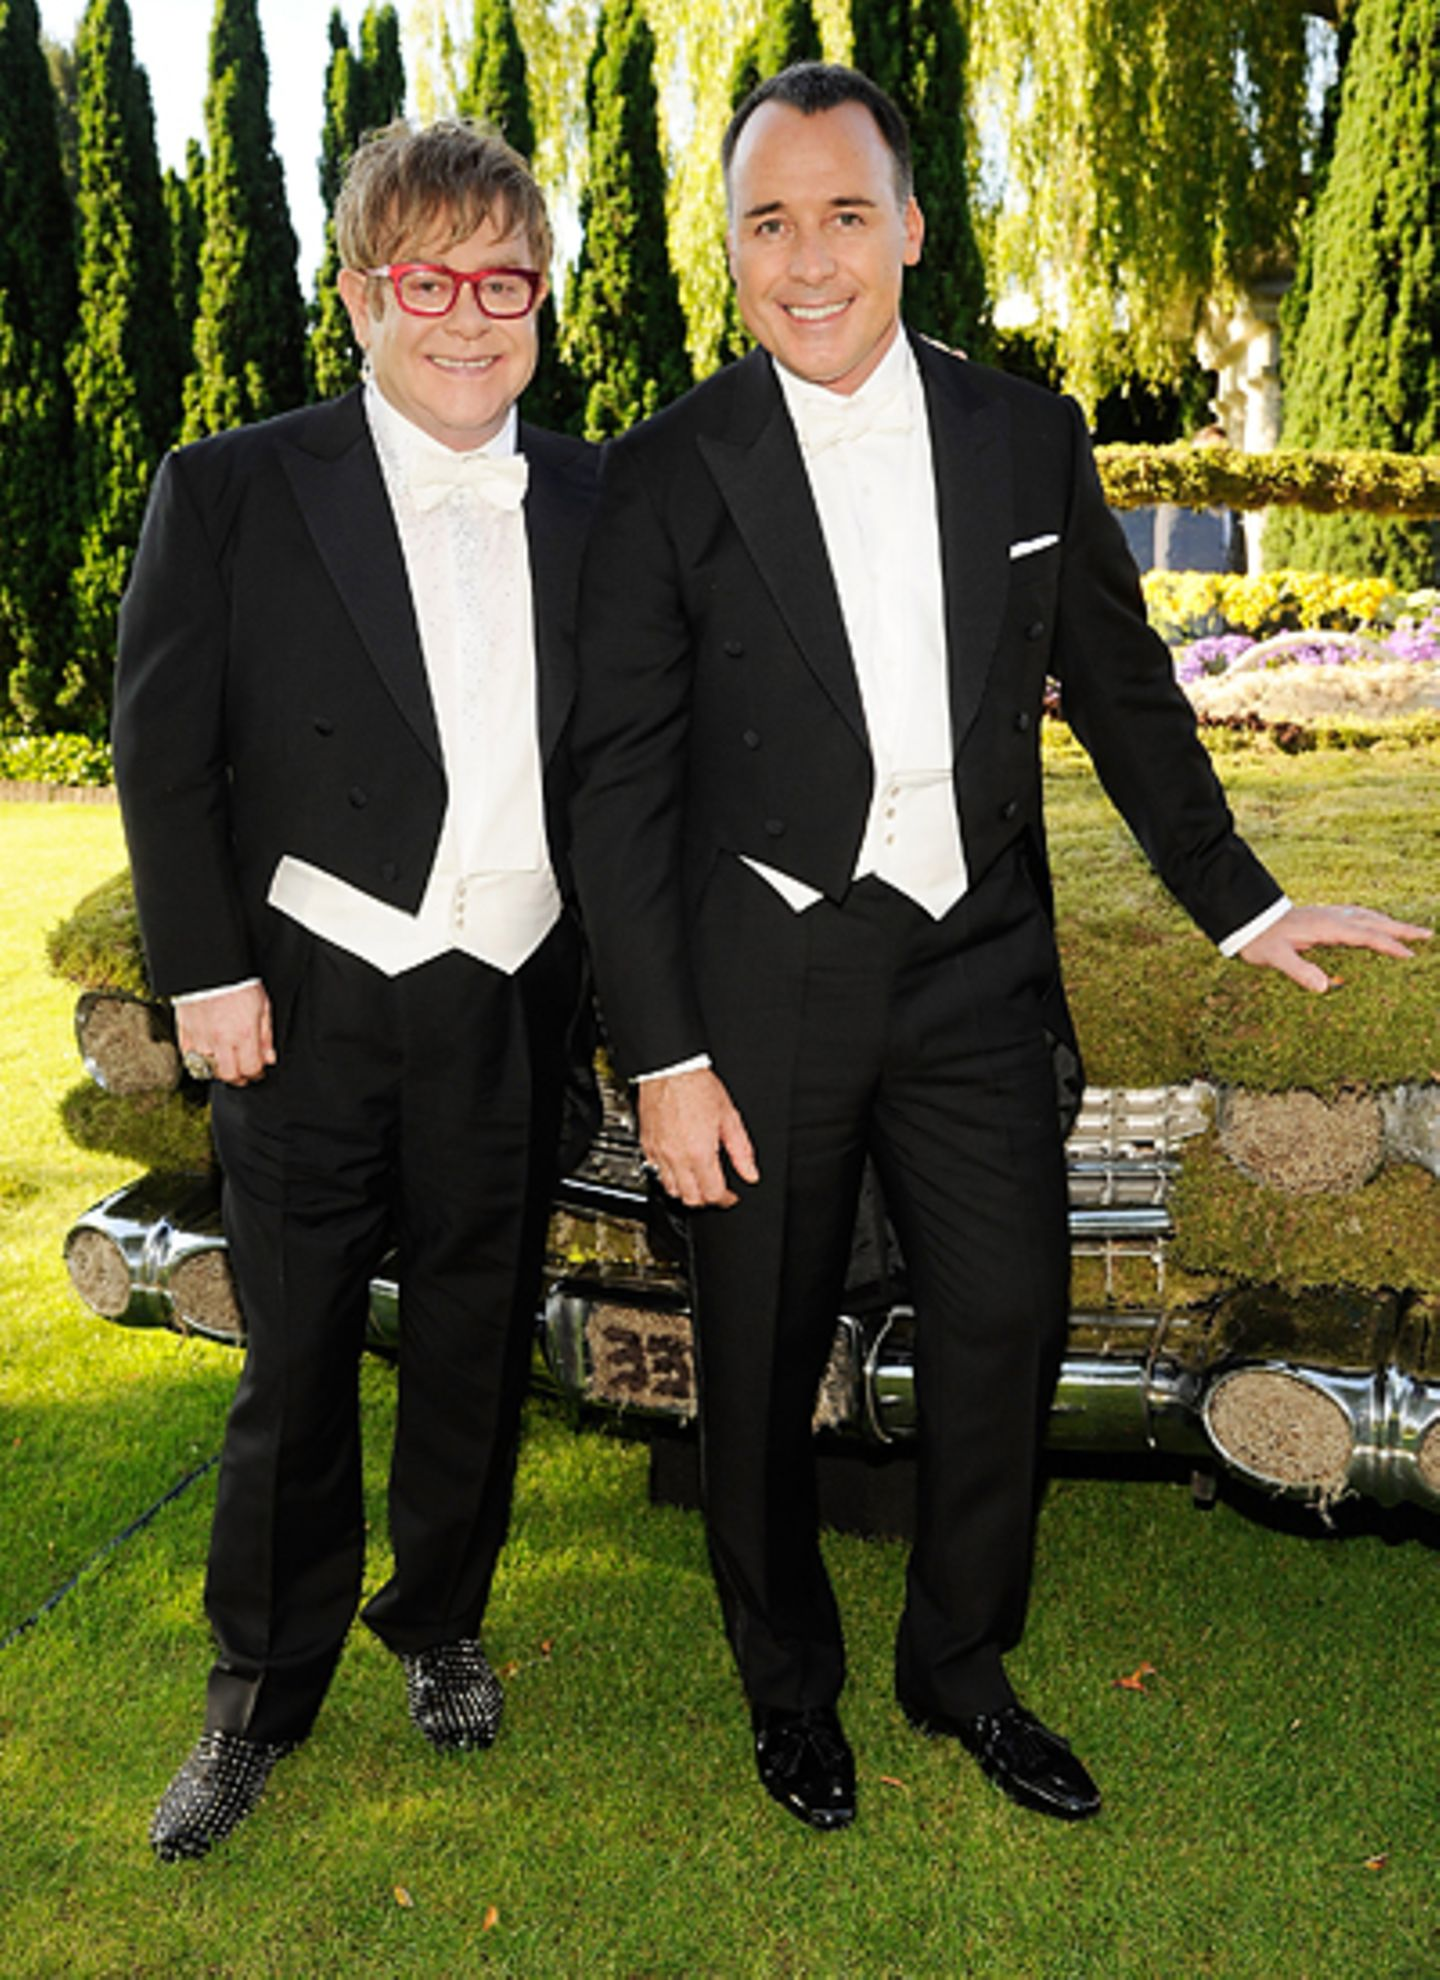 White Tie & Tiara Ball 2012: Elton John und David Furnish